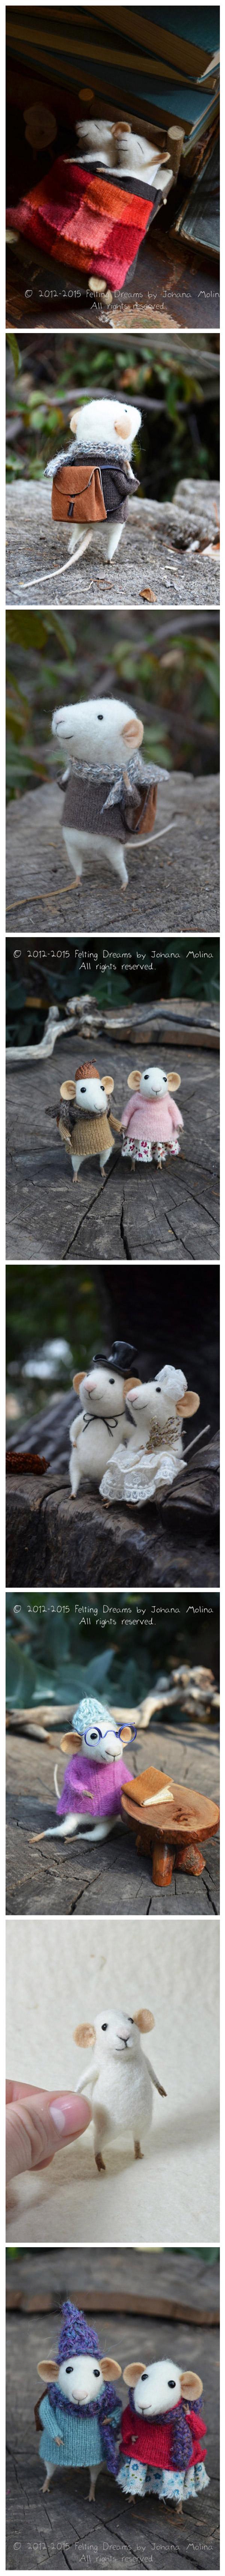 Una aventura en miniatura